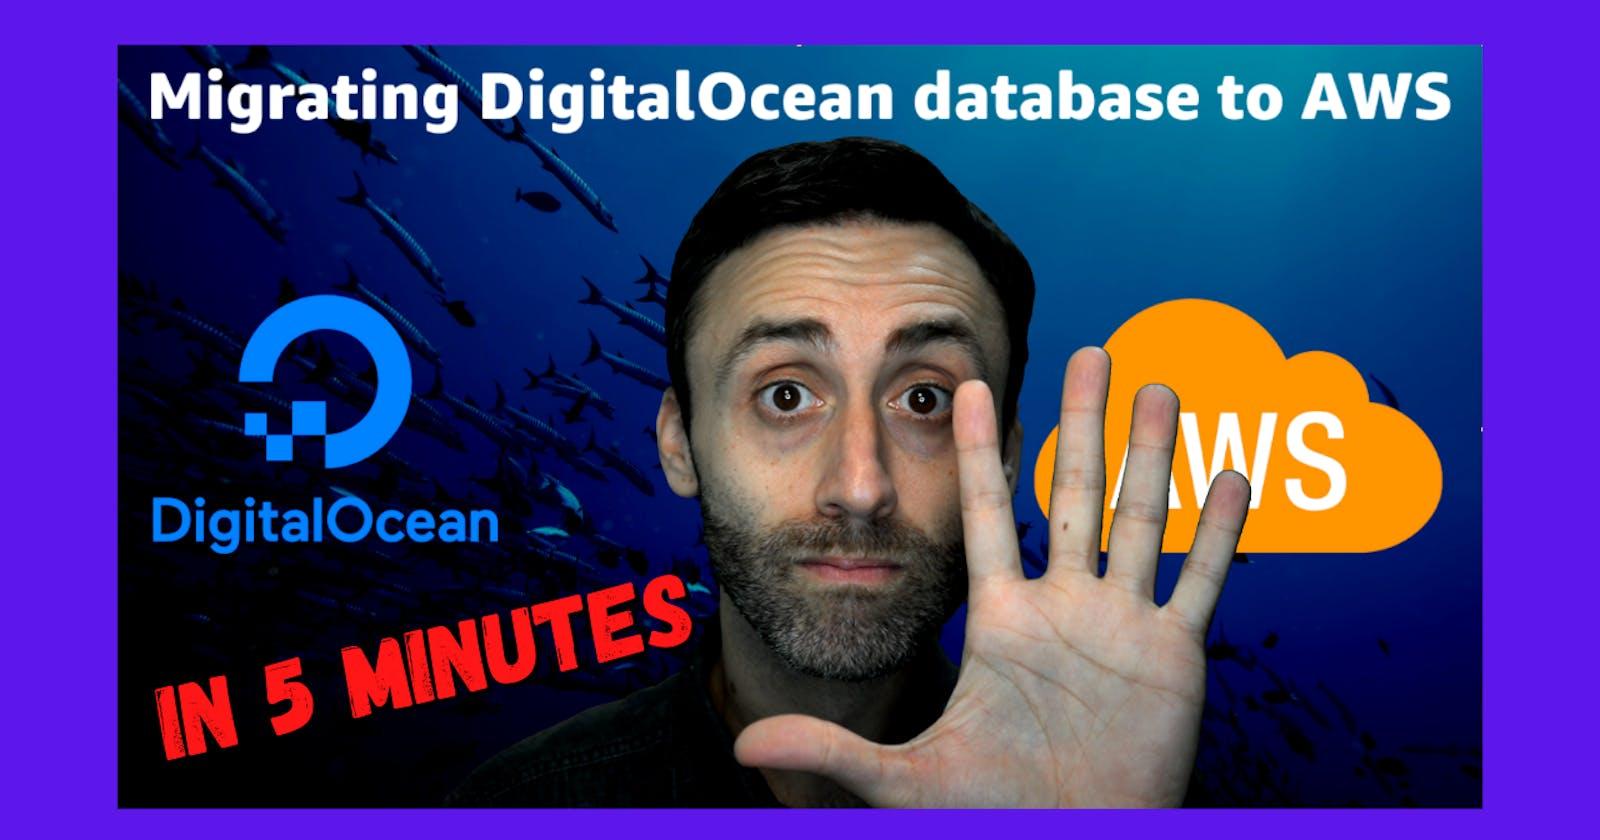 Migrating DigitalOcean database to AWS